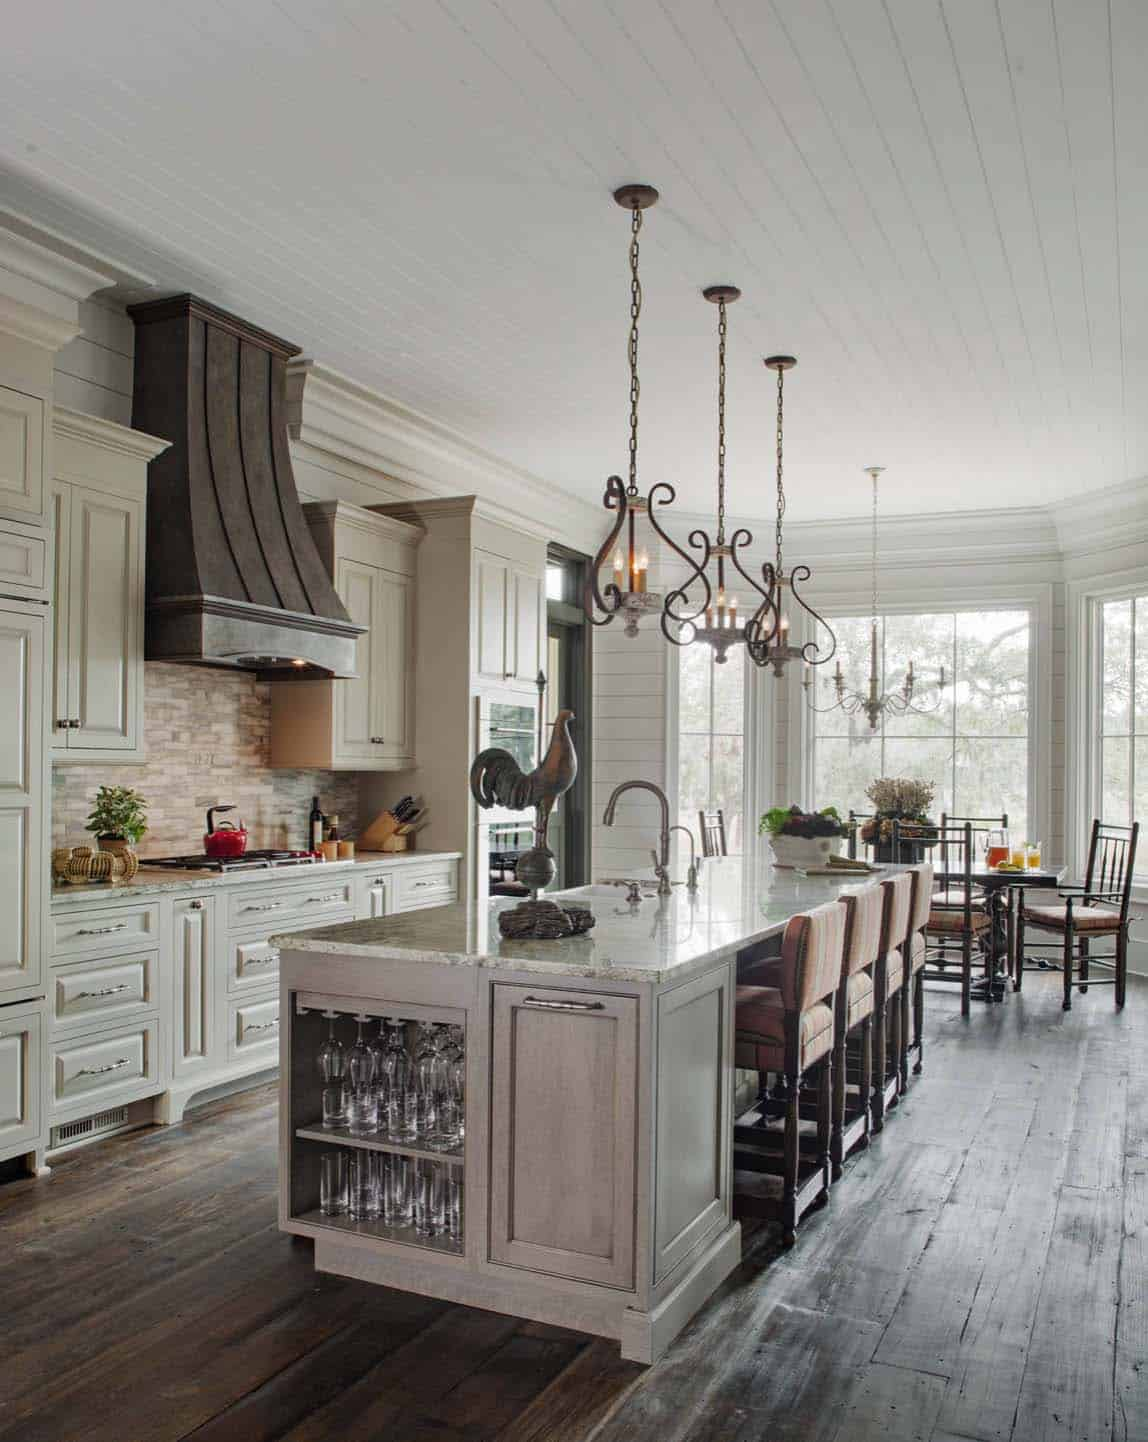 35+ Amazingly creative and stylish farmhouse kitchen ideas on Farmhouse Kitchen Ideas  id=58535